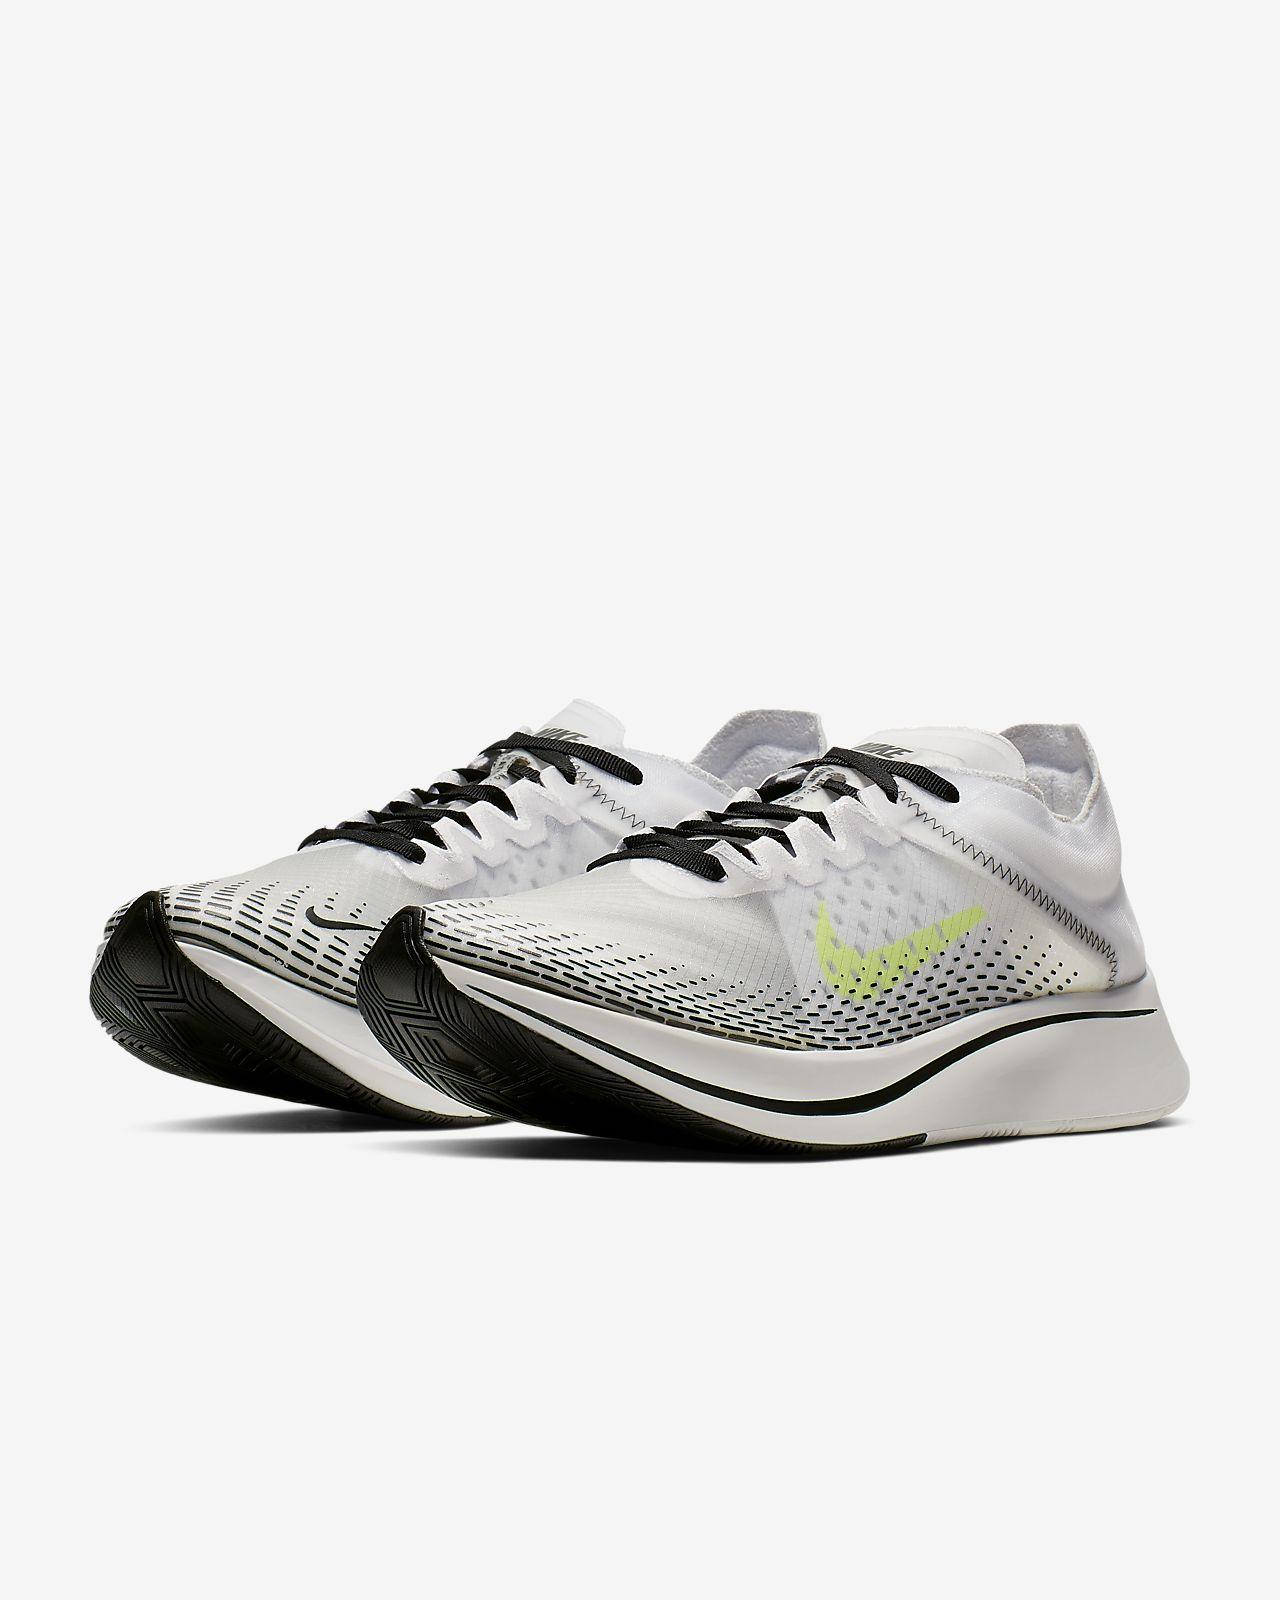 44f78ab5e84ea Nike Zoom Fly SP Fast Running Shoe. Nike.com CA